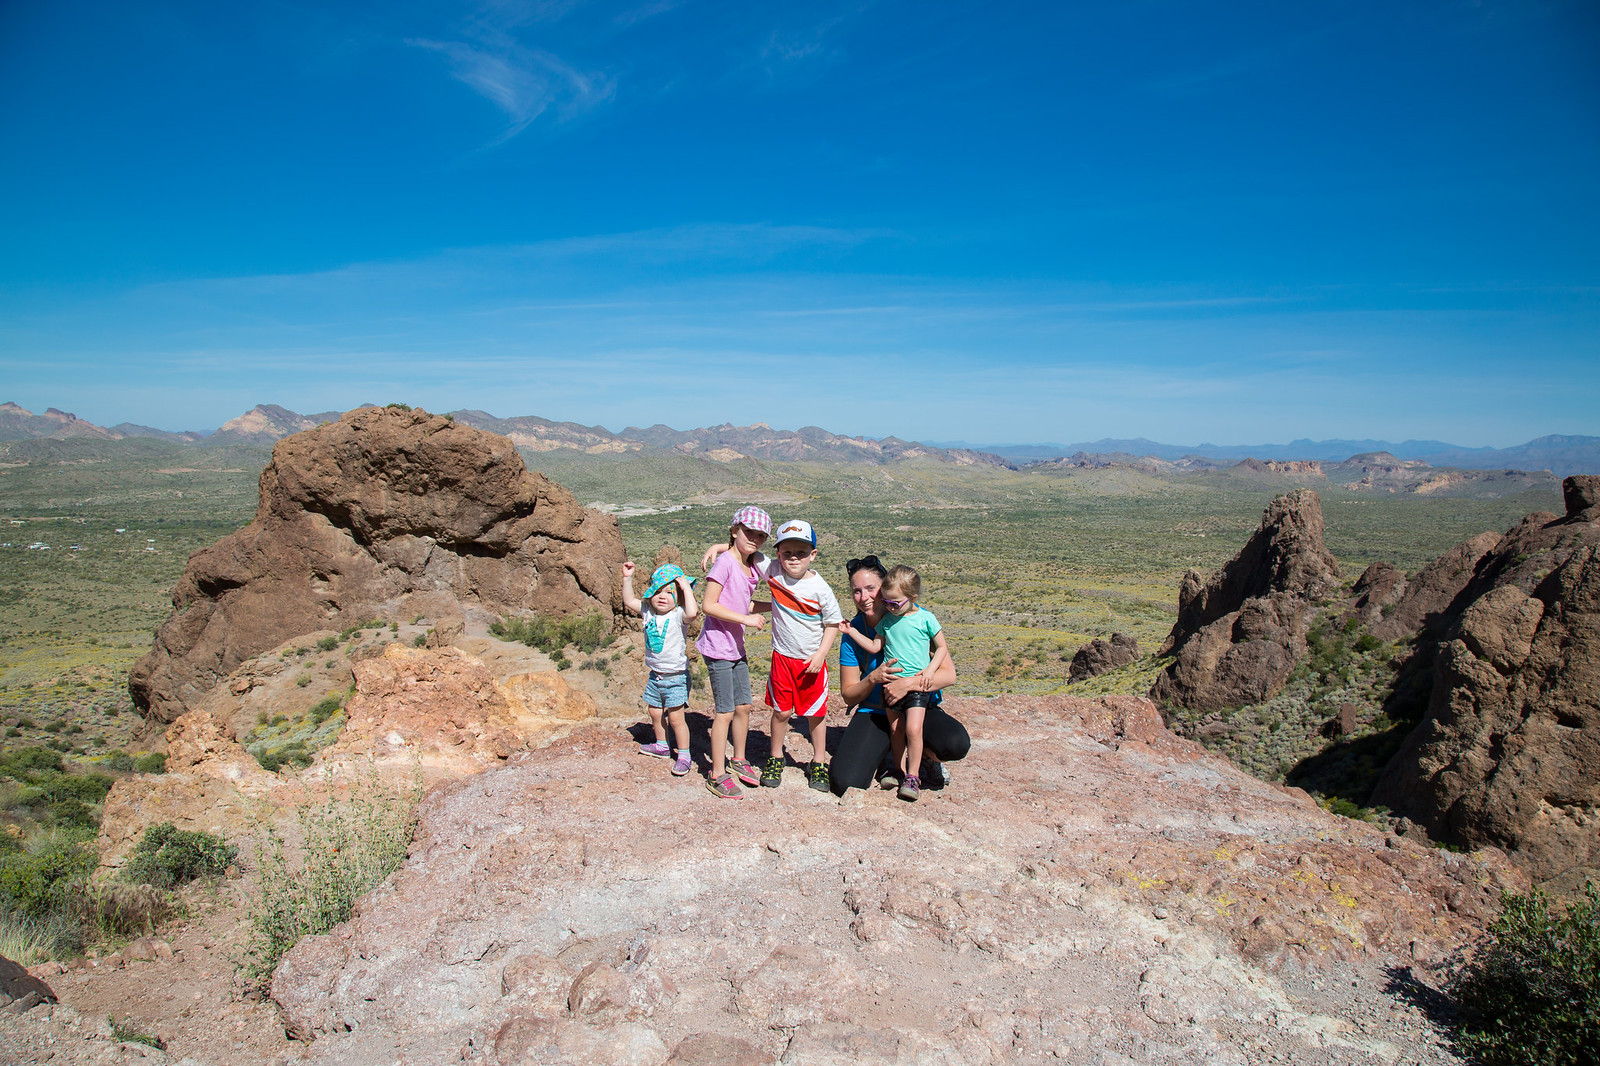 2015-03-12 Arizona-6422.jpg